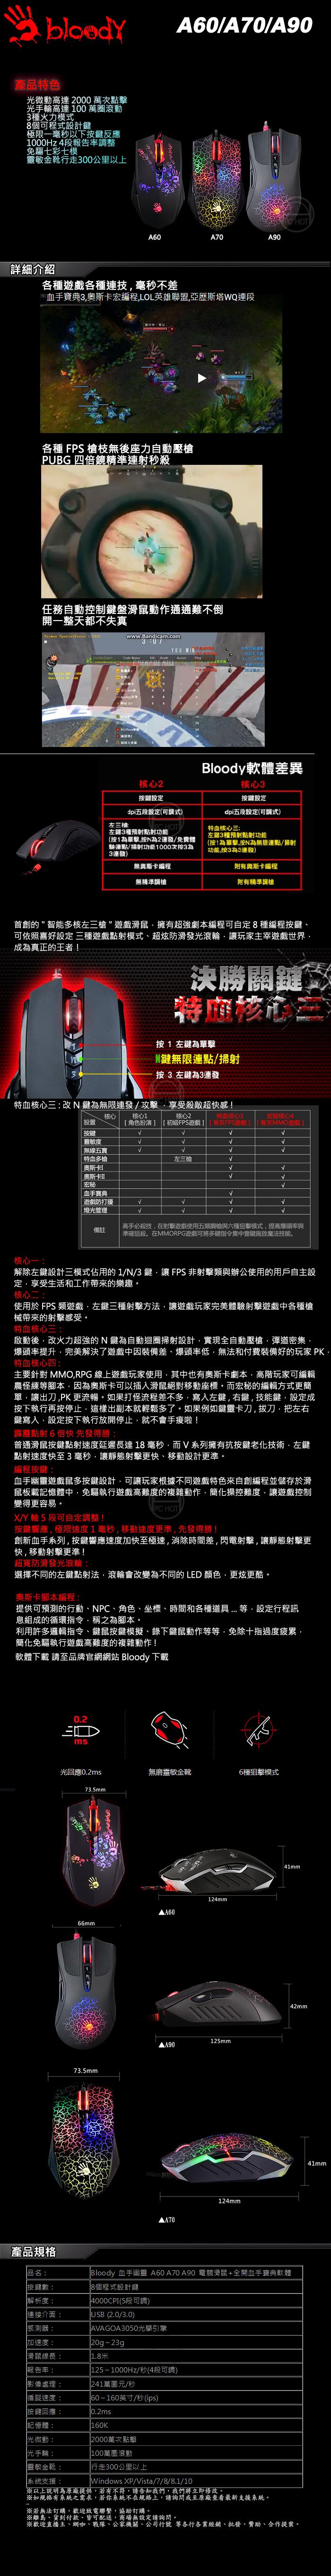 Bloody 血手幽靈 A60 A70 A90 電競滑鼠 /送軟體/4000dpi/光微動/3年保/Dragclick